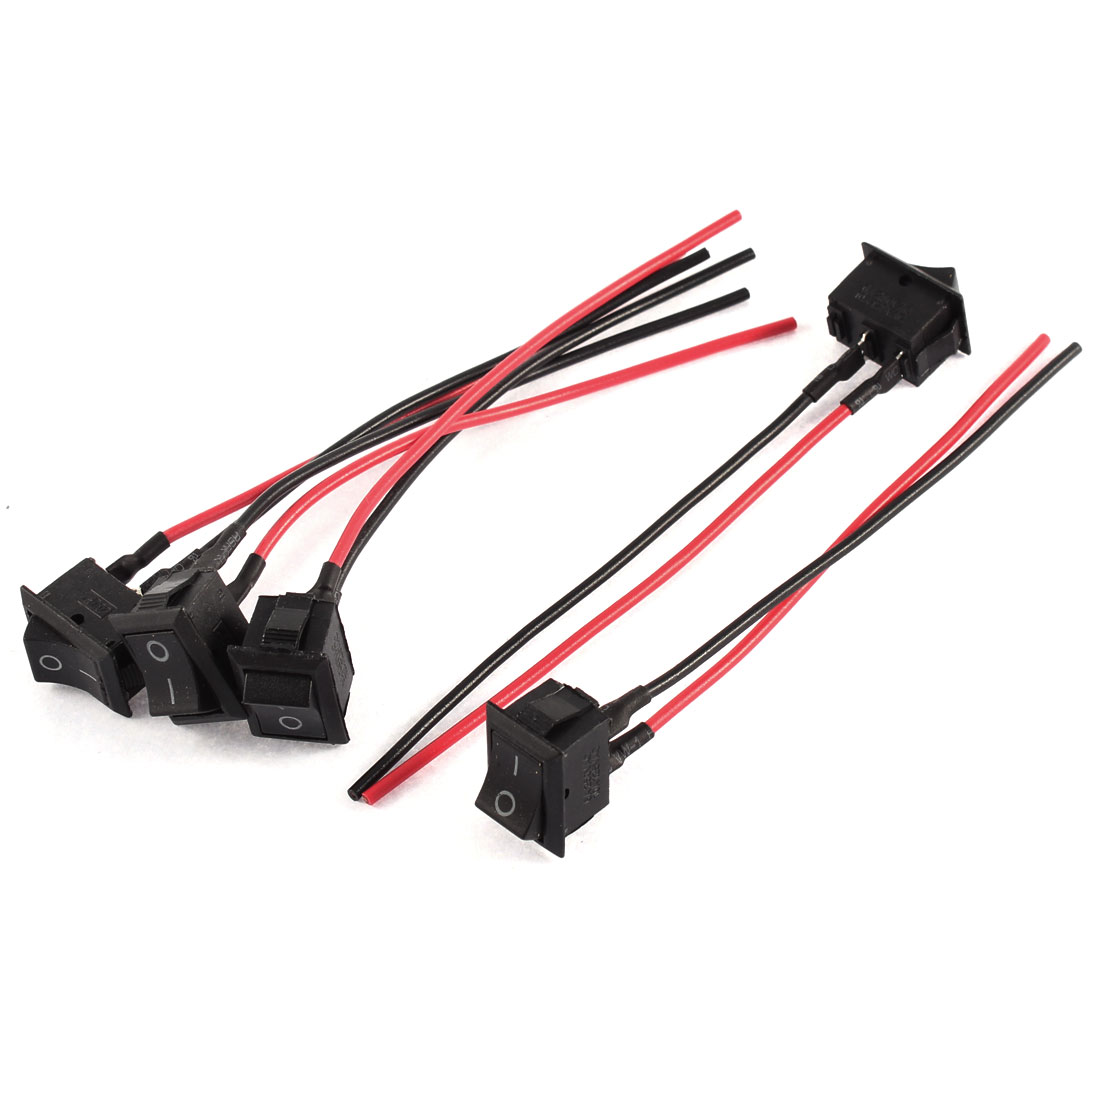 5 x on/off Rectangular DIY Auto Car Rocker Switch Wire AC 250V/6A 125V/10A